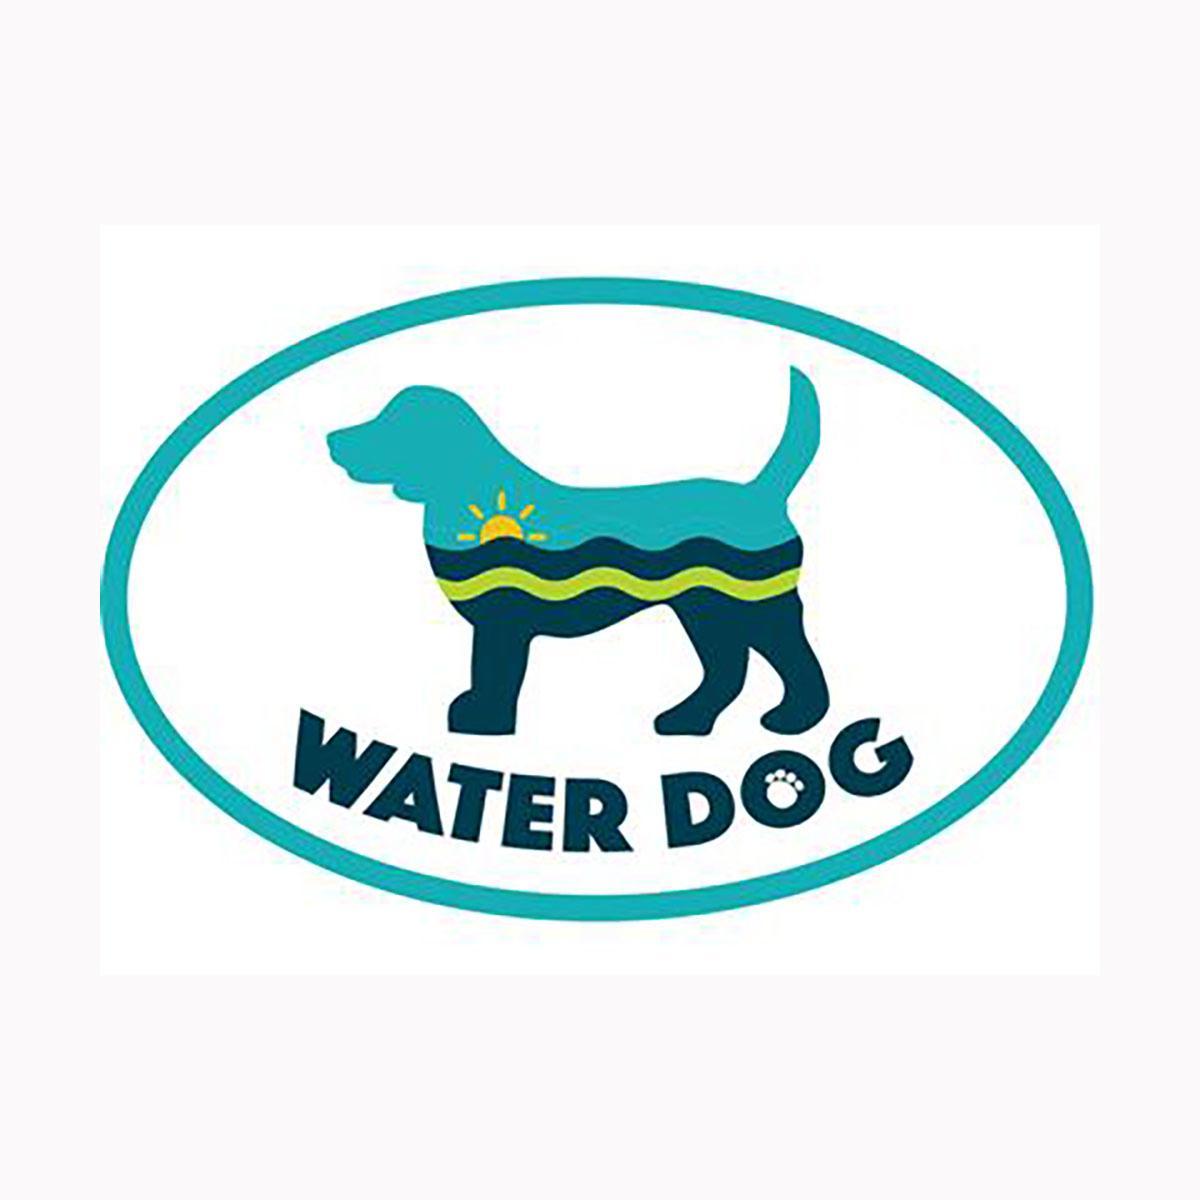 Water Dog Oval Magnet by Dog Speak